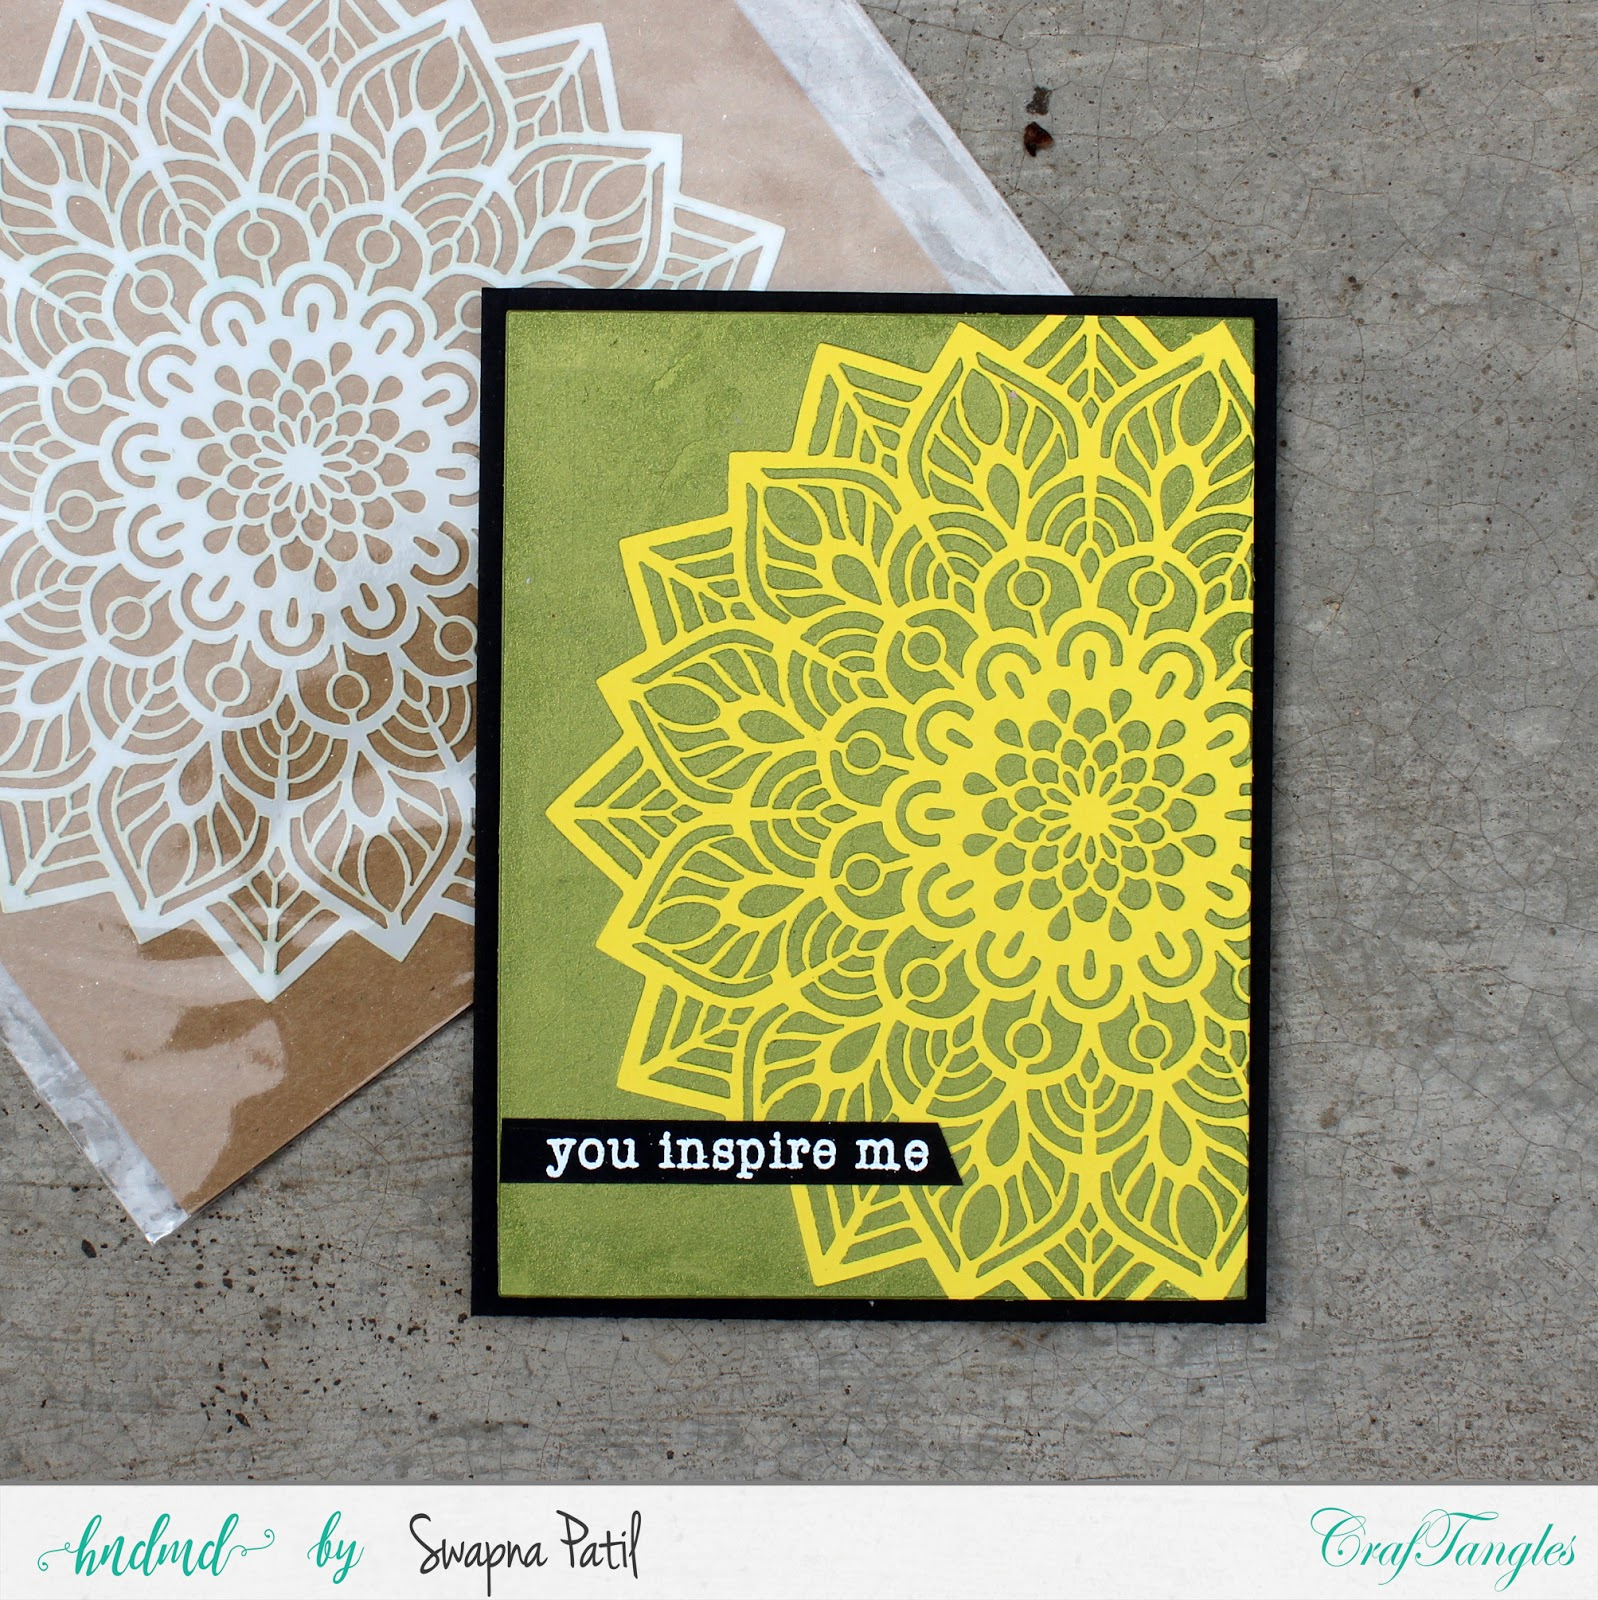 Cards for teachers Part 2 - Swapna Patil 2